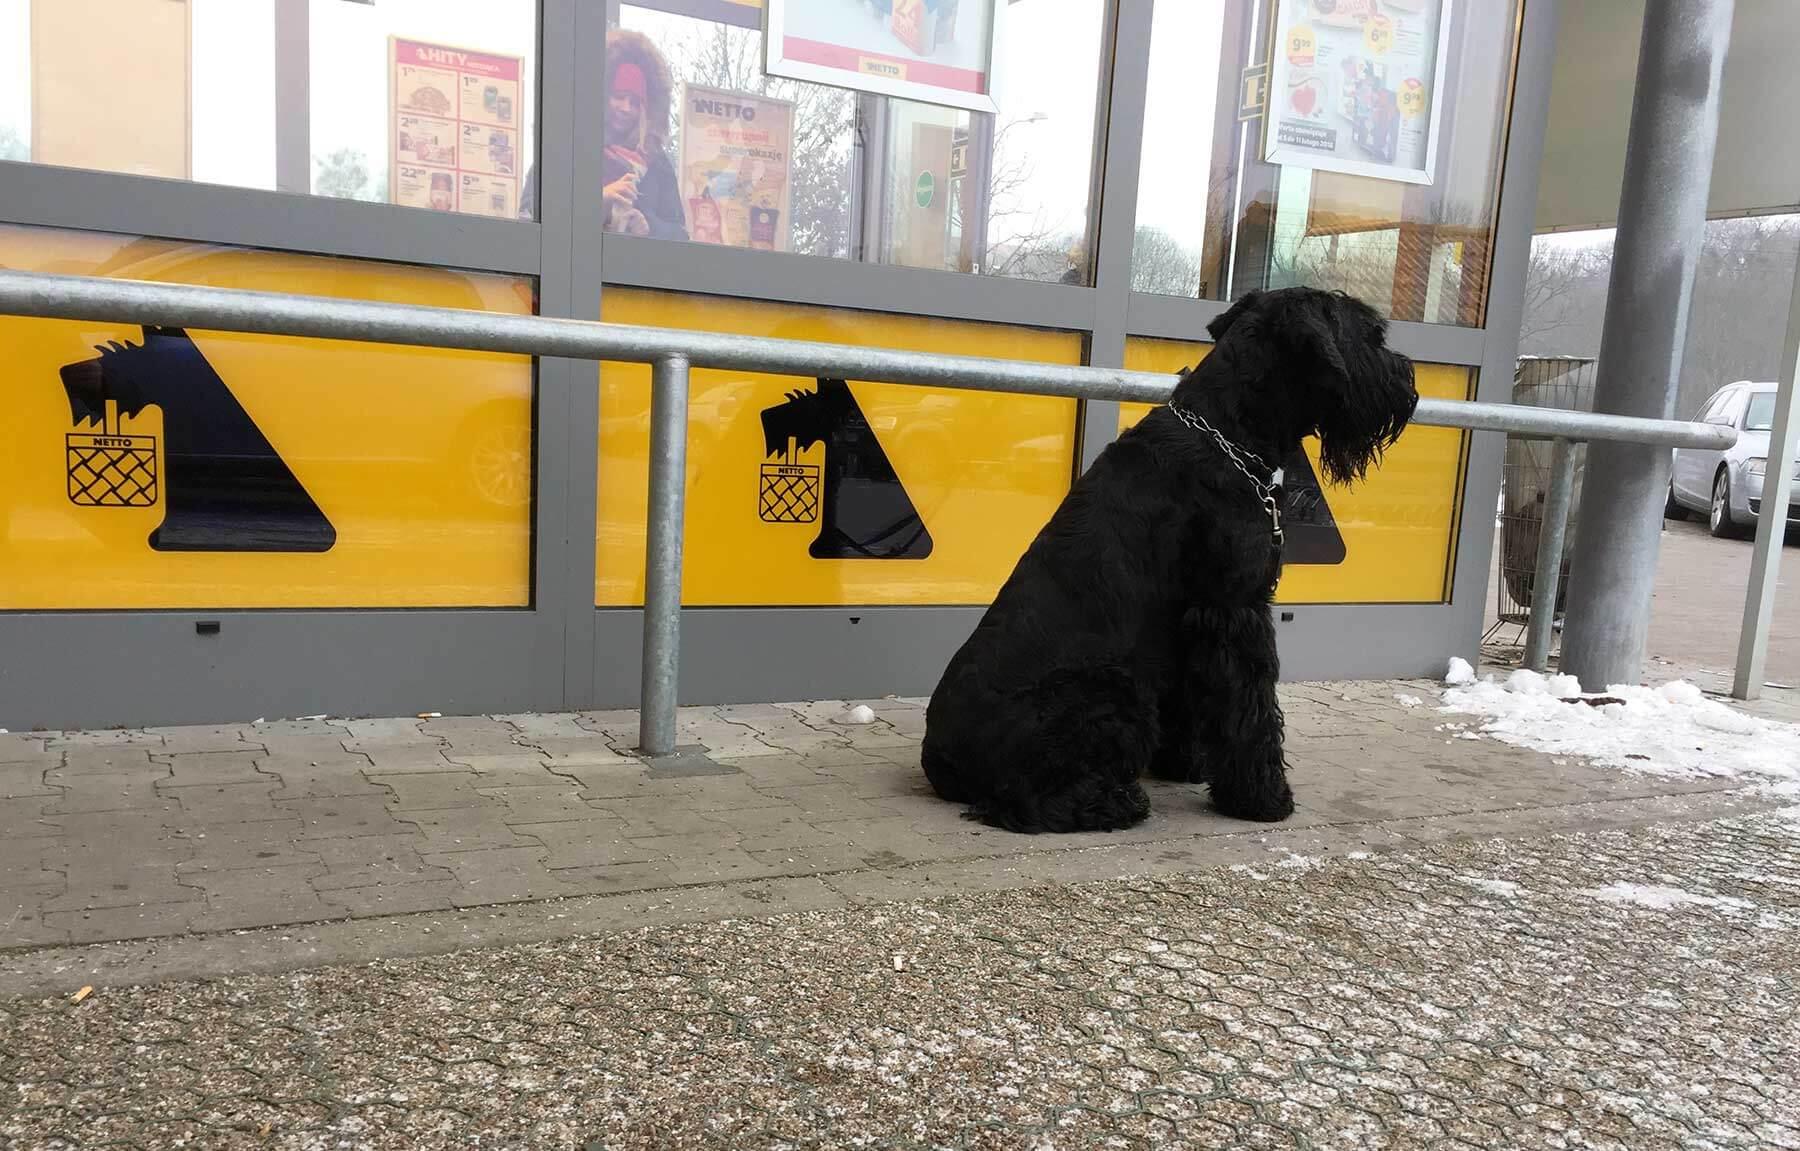 Bilderparade CDLXXXVI LangweileDich.net_Bilderparade_CDLXXXVI_01